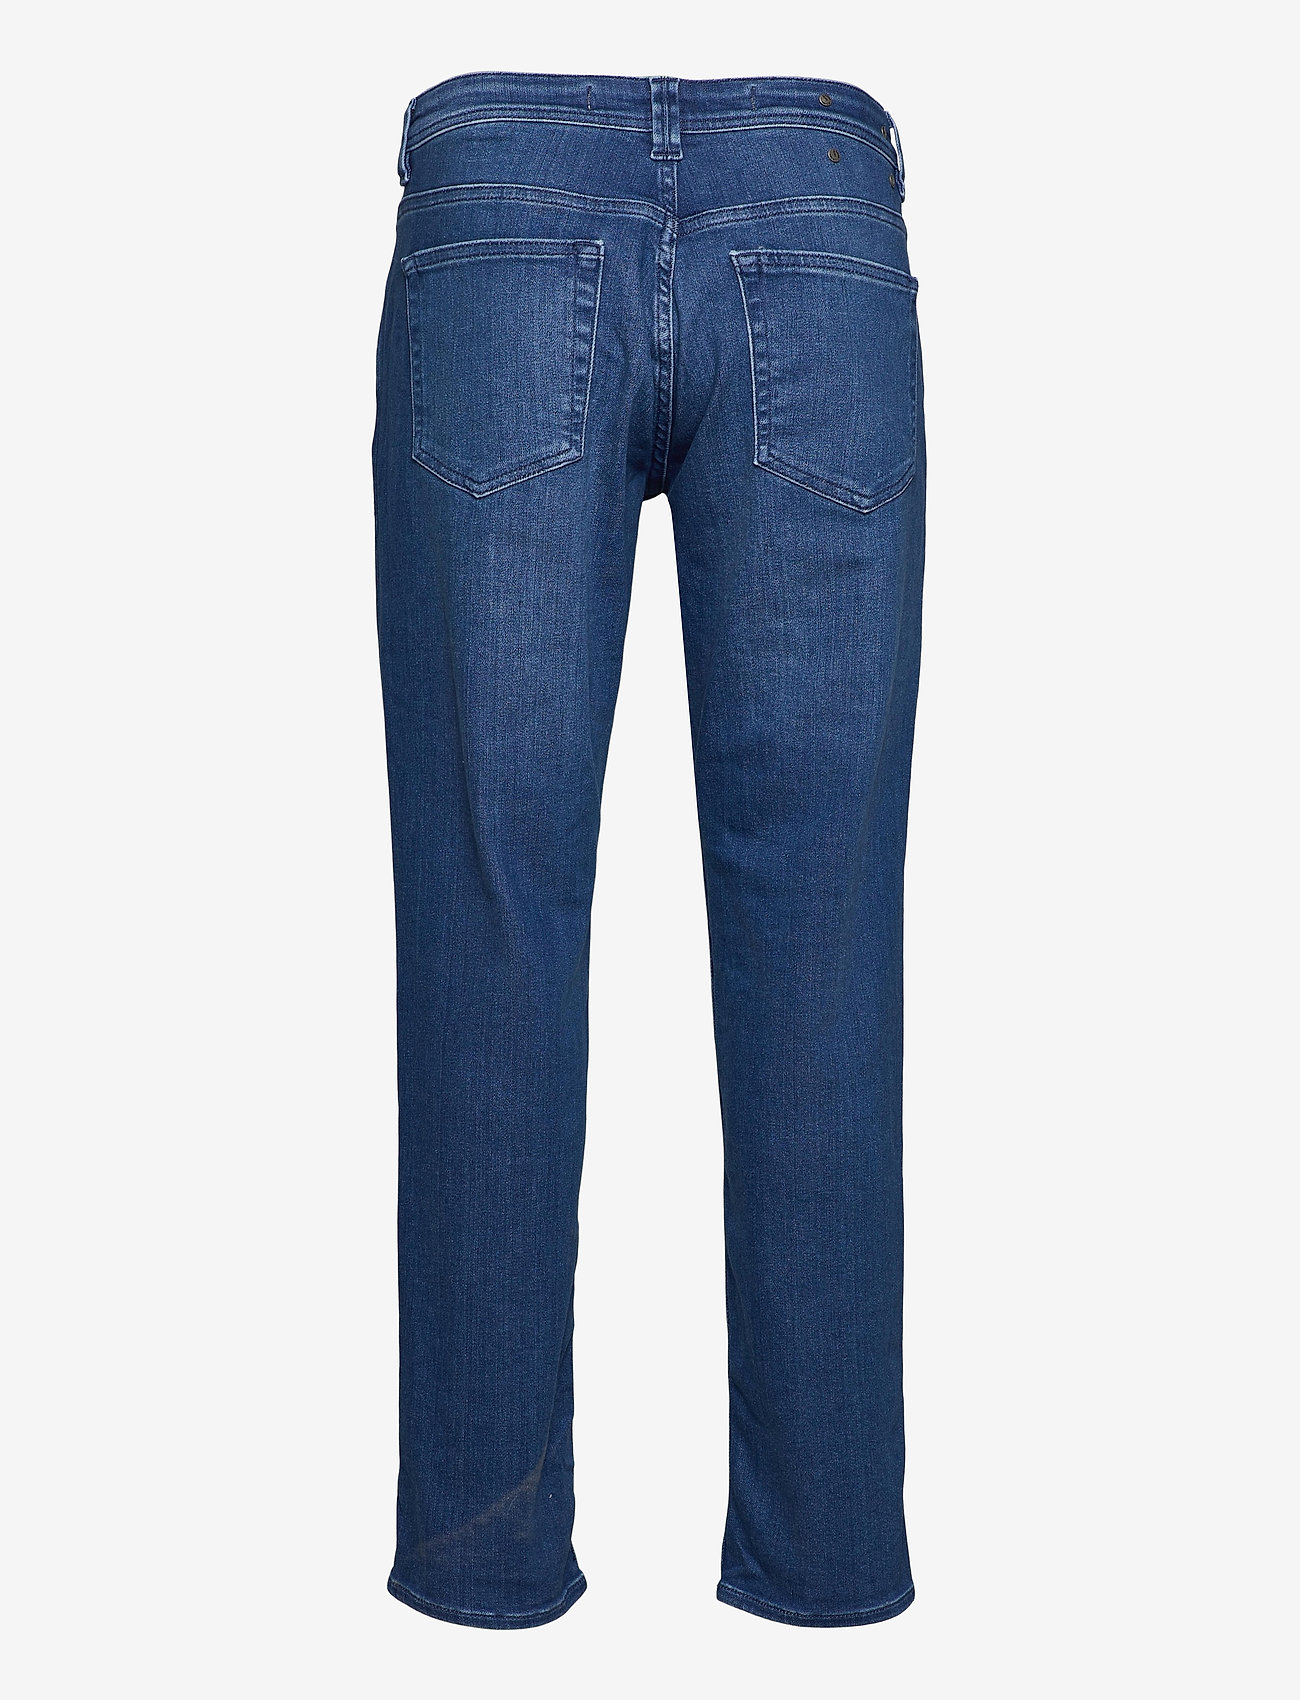 Gabba - Nico K3897 Jeans - regular jeans - rs1347 - 1